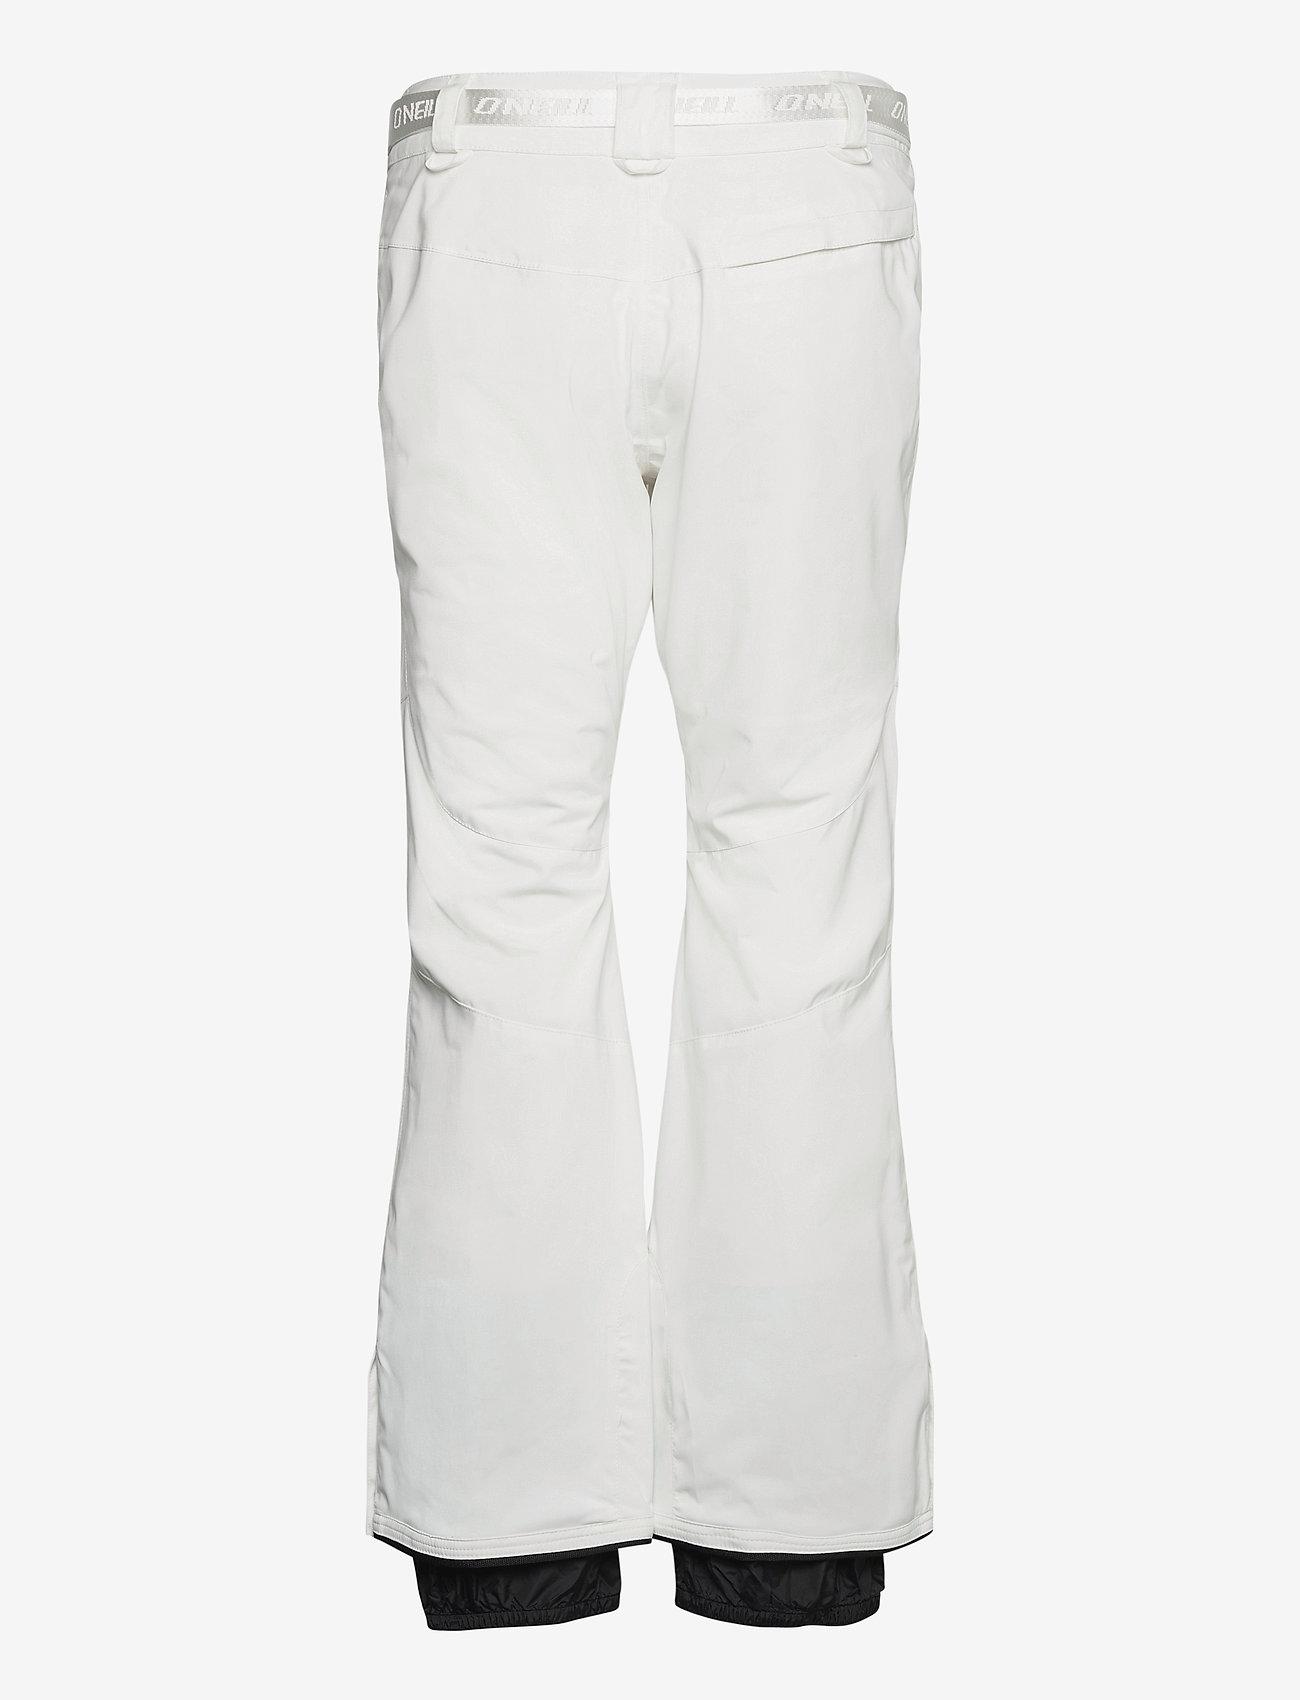 O'Neill - PW STAR SLIM PANTS - skibroeken - powder white - 1